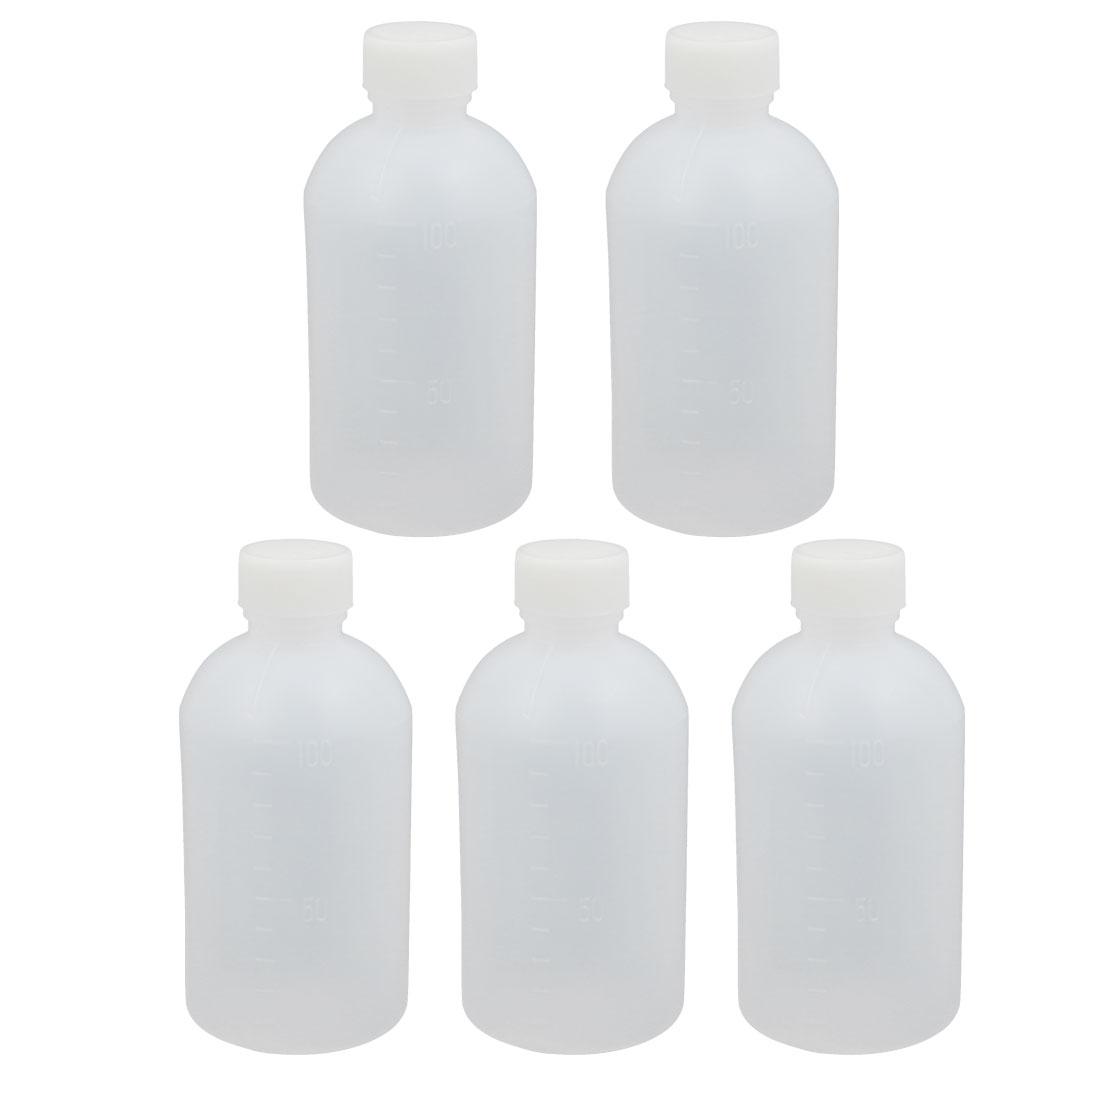 5Pcs 100ml Plastic Translucent Round Solid Powder Bottle Storage Container Jar